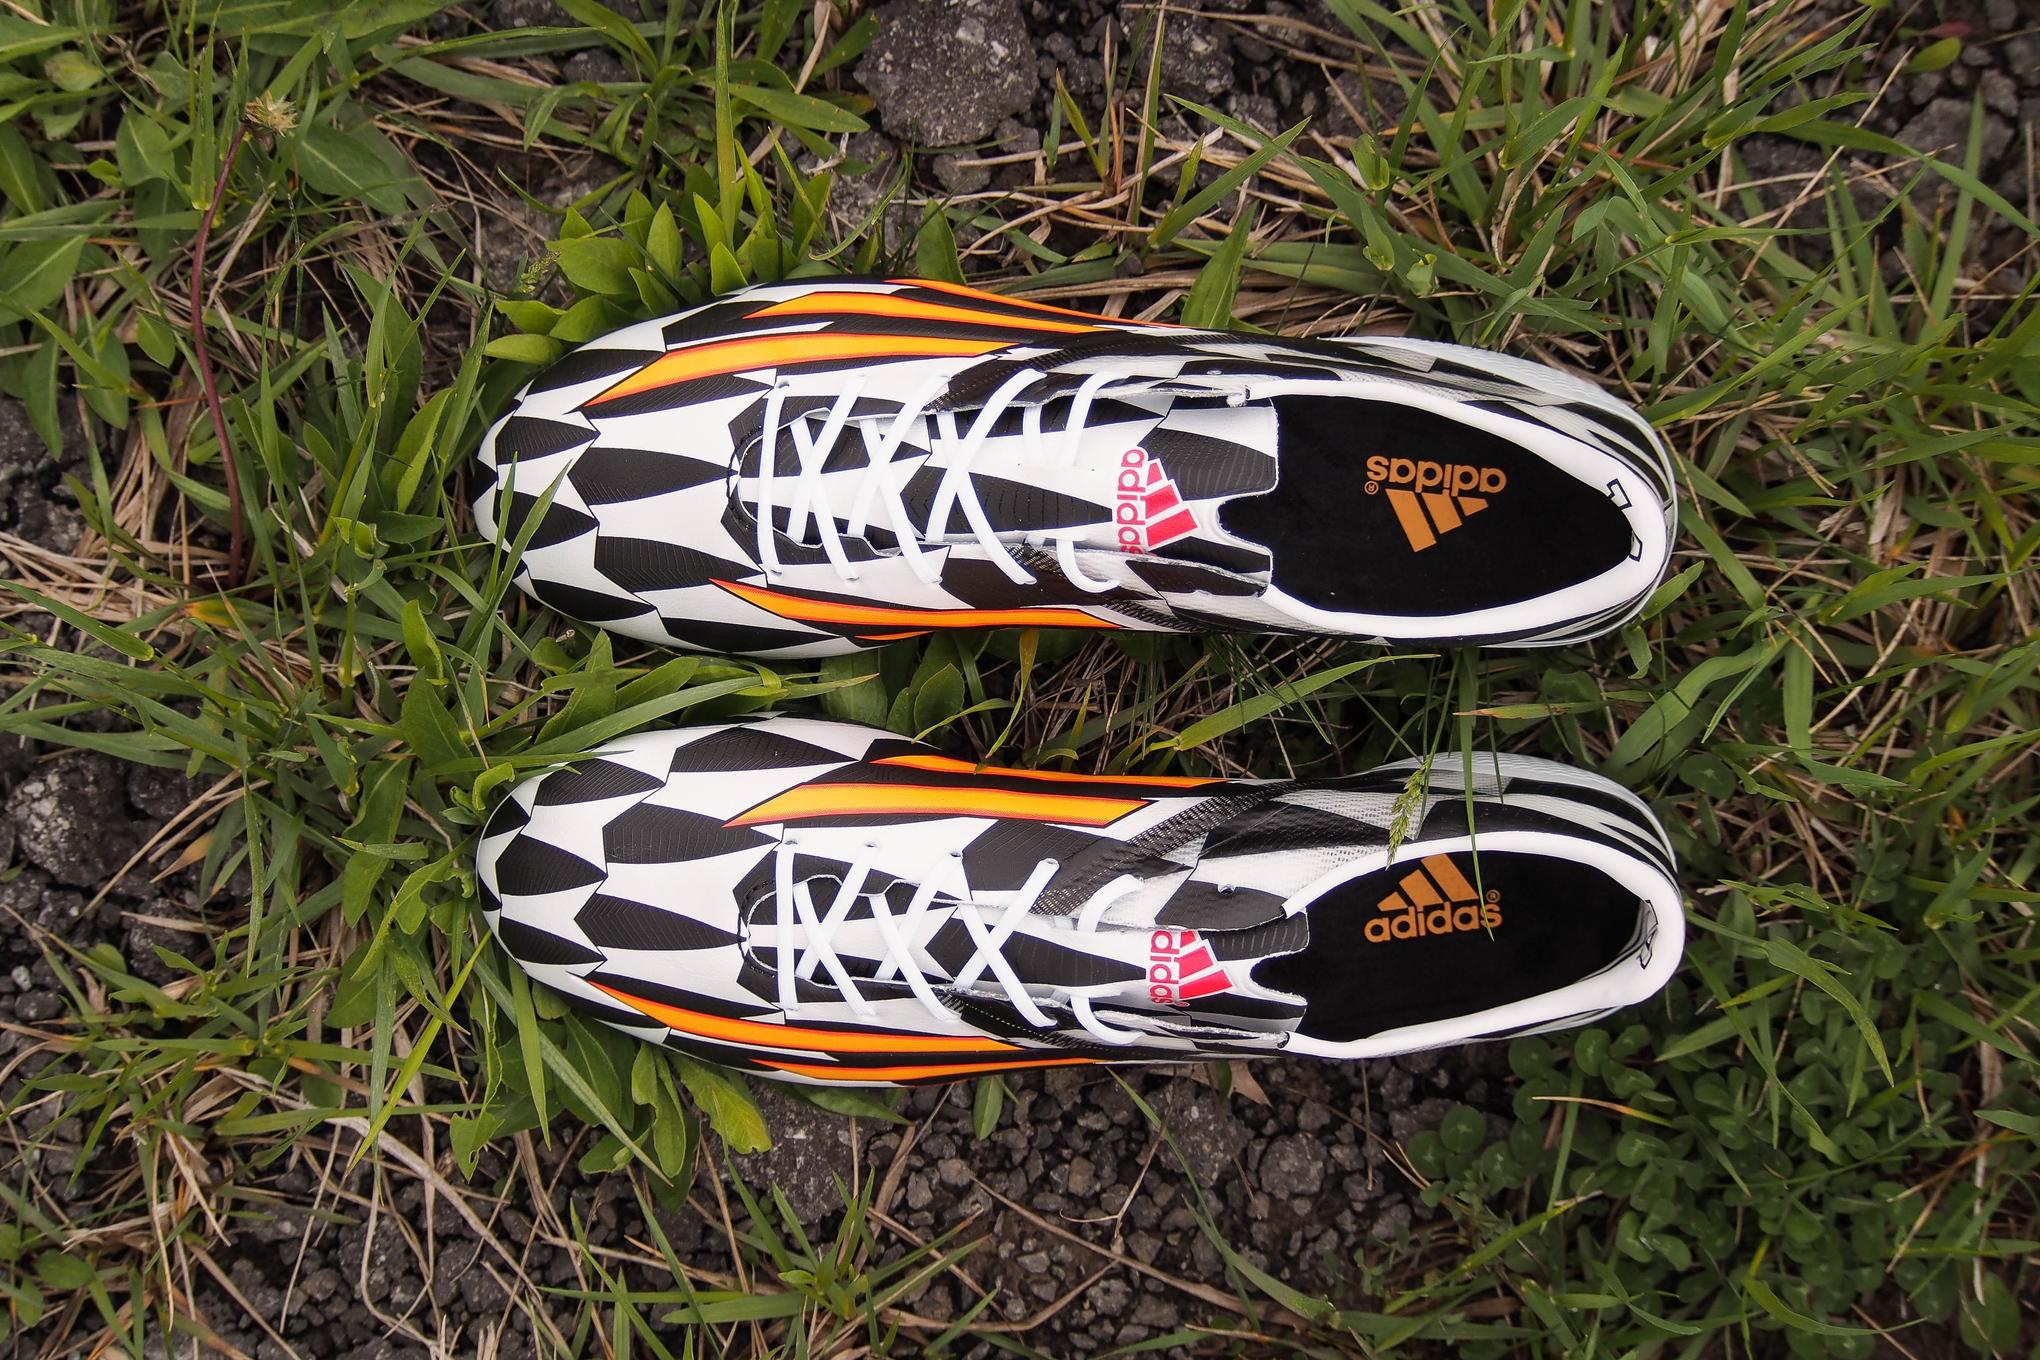 a93d33121f49 8b06e 0d992; order adidas battle pack f50 photo by mark yesilevskiy f81bb  f0741